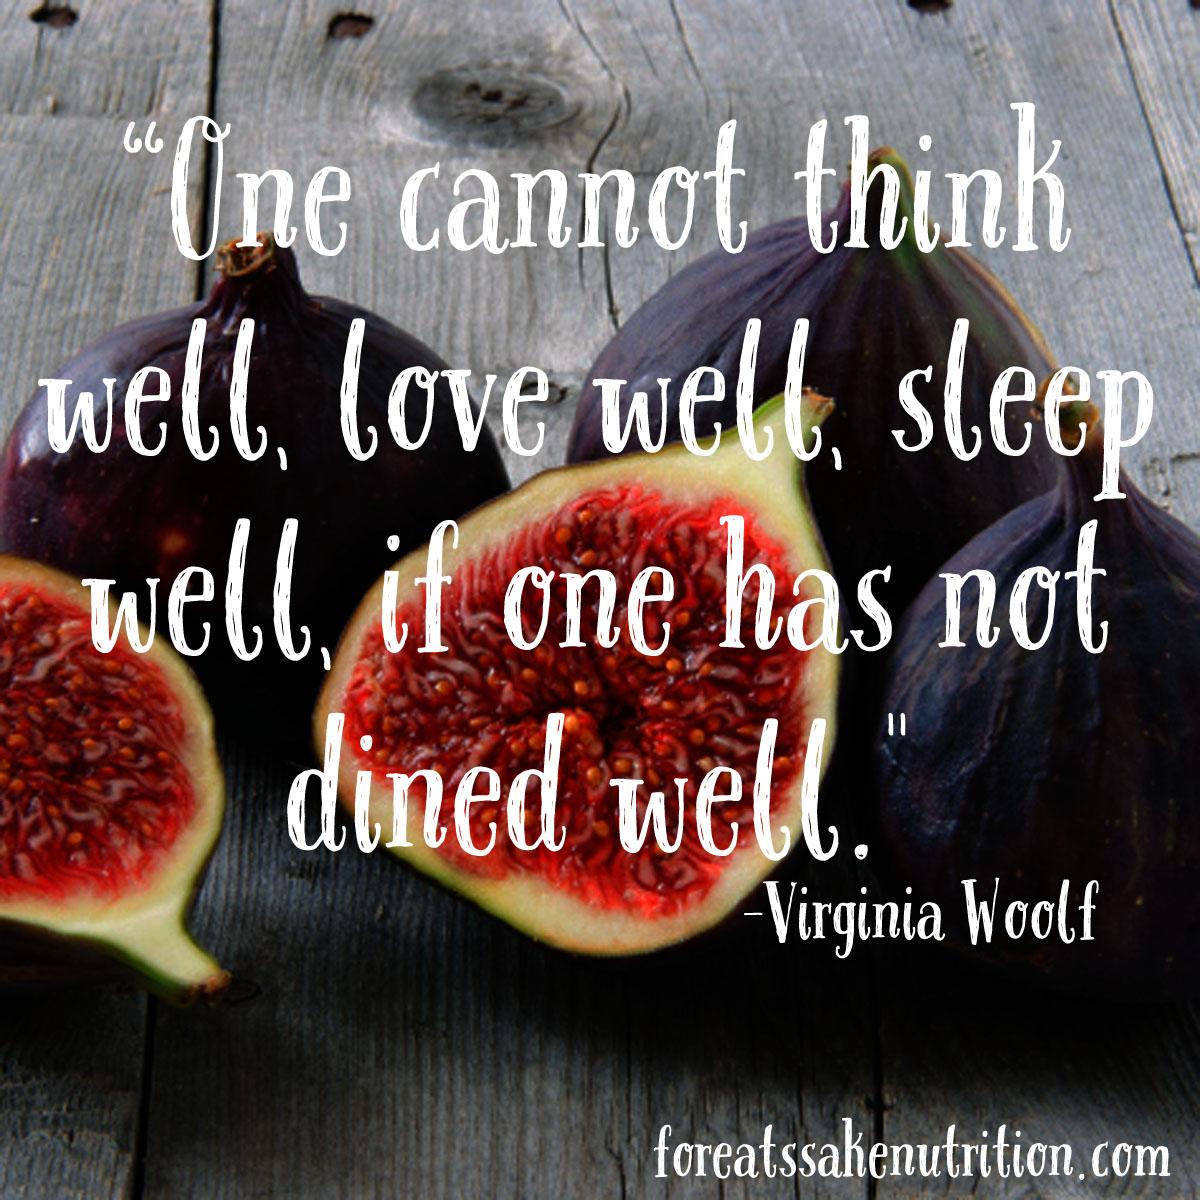 figs virginia woolf eat well love well sleep well think well